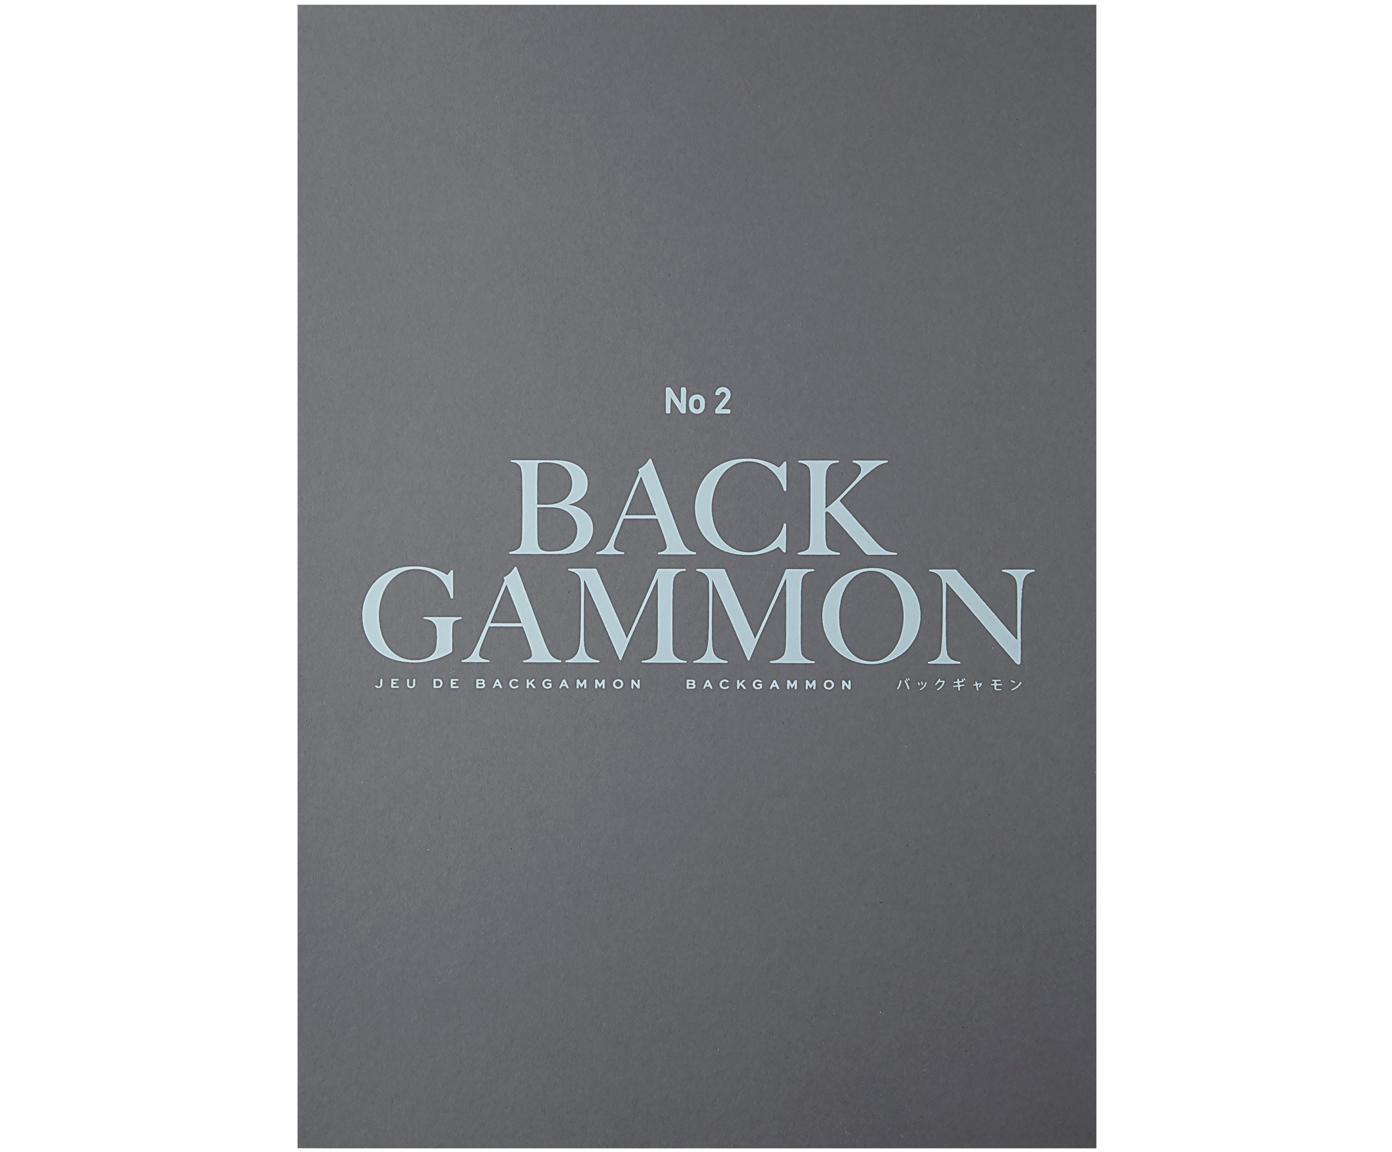 Backgammonset Classic, Papier, acryl, Grijs, zwart, turquoise, wit, 31 x 5 cm